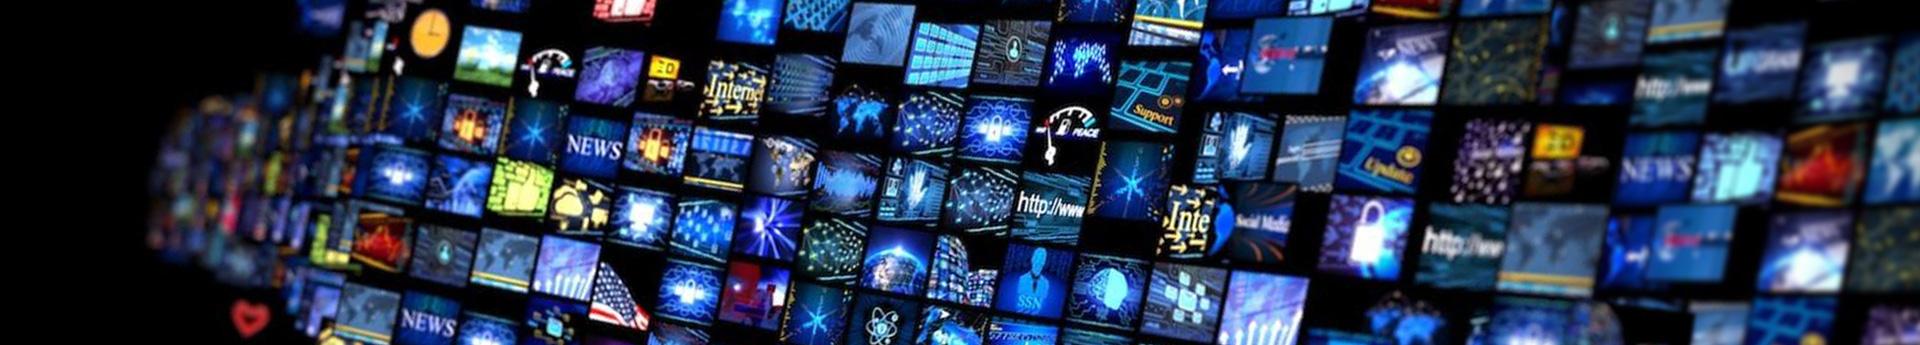 تلویزیونهای تعاملی